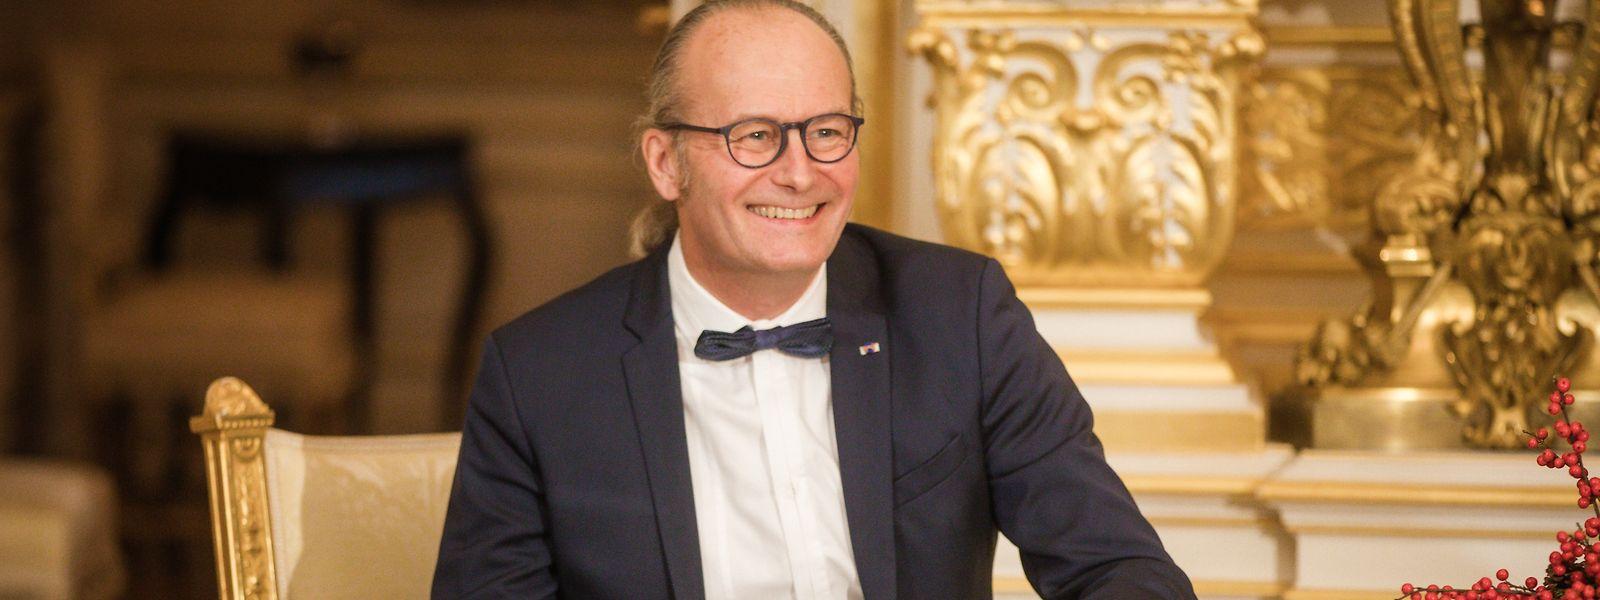 Grüne Handschrift: Claude Turmes soll die Energiewende in Luxemburg herbeiführen.